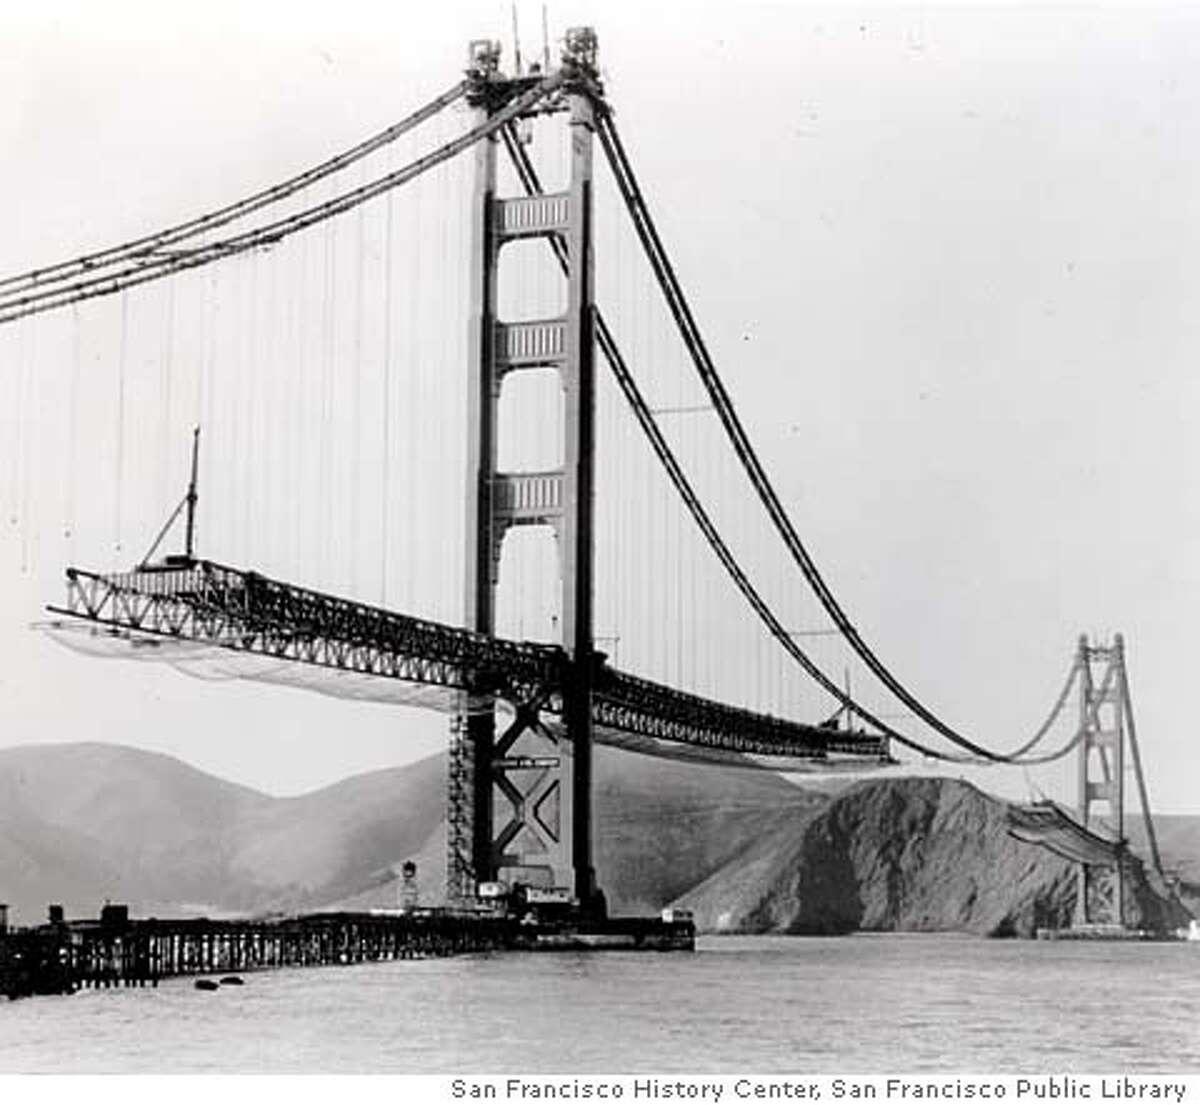 GGBRIDGE01 Golden Gate Bridge, March 30, 1965 Credit: San Francisco History Center, San Francisco Public Library